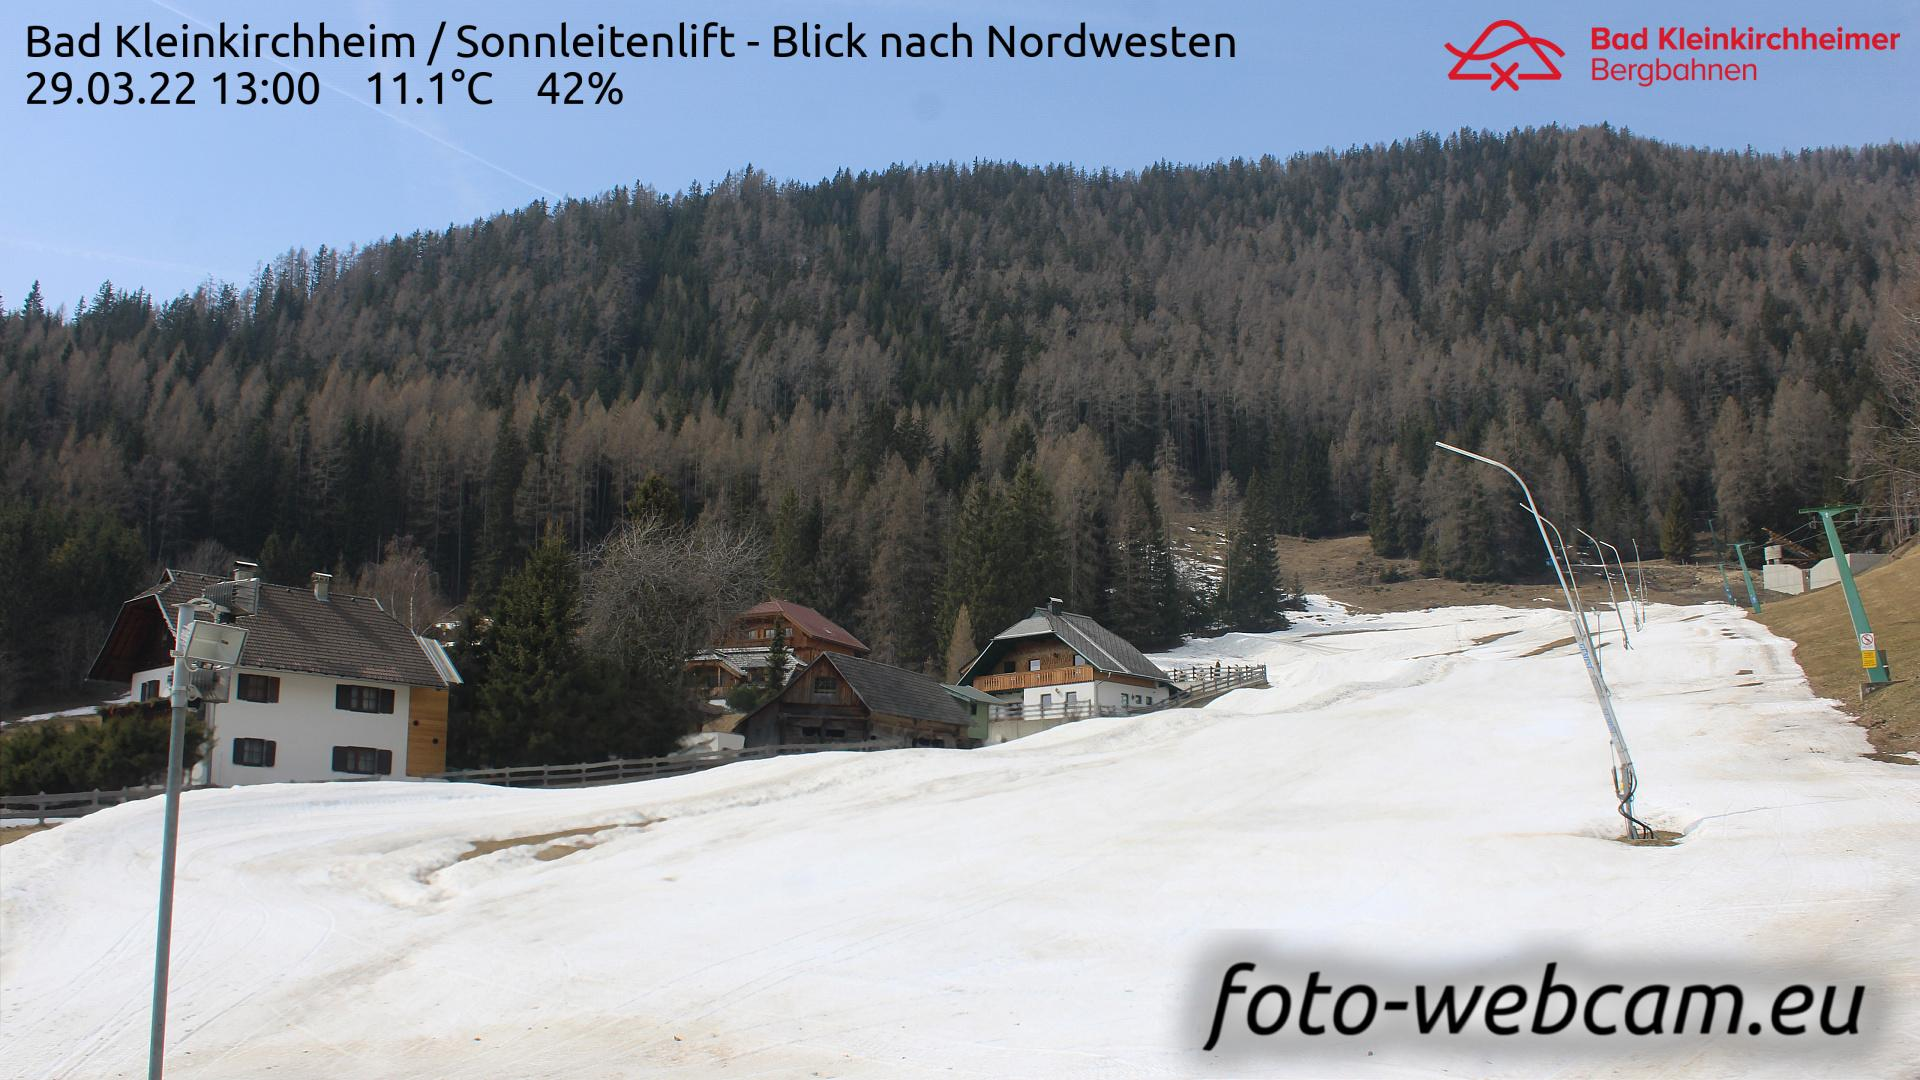 Webcam Sankt Oswald: Bad Kleinkirchheim − Sonnleitenlift